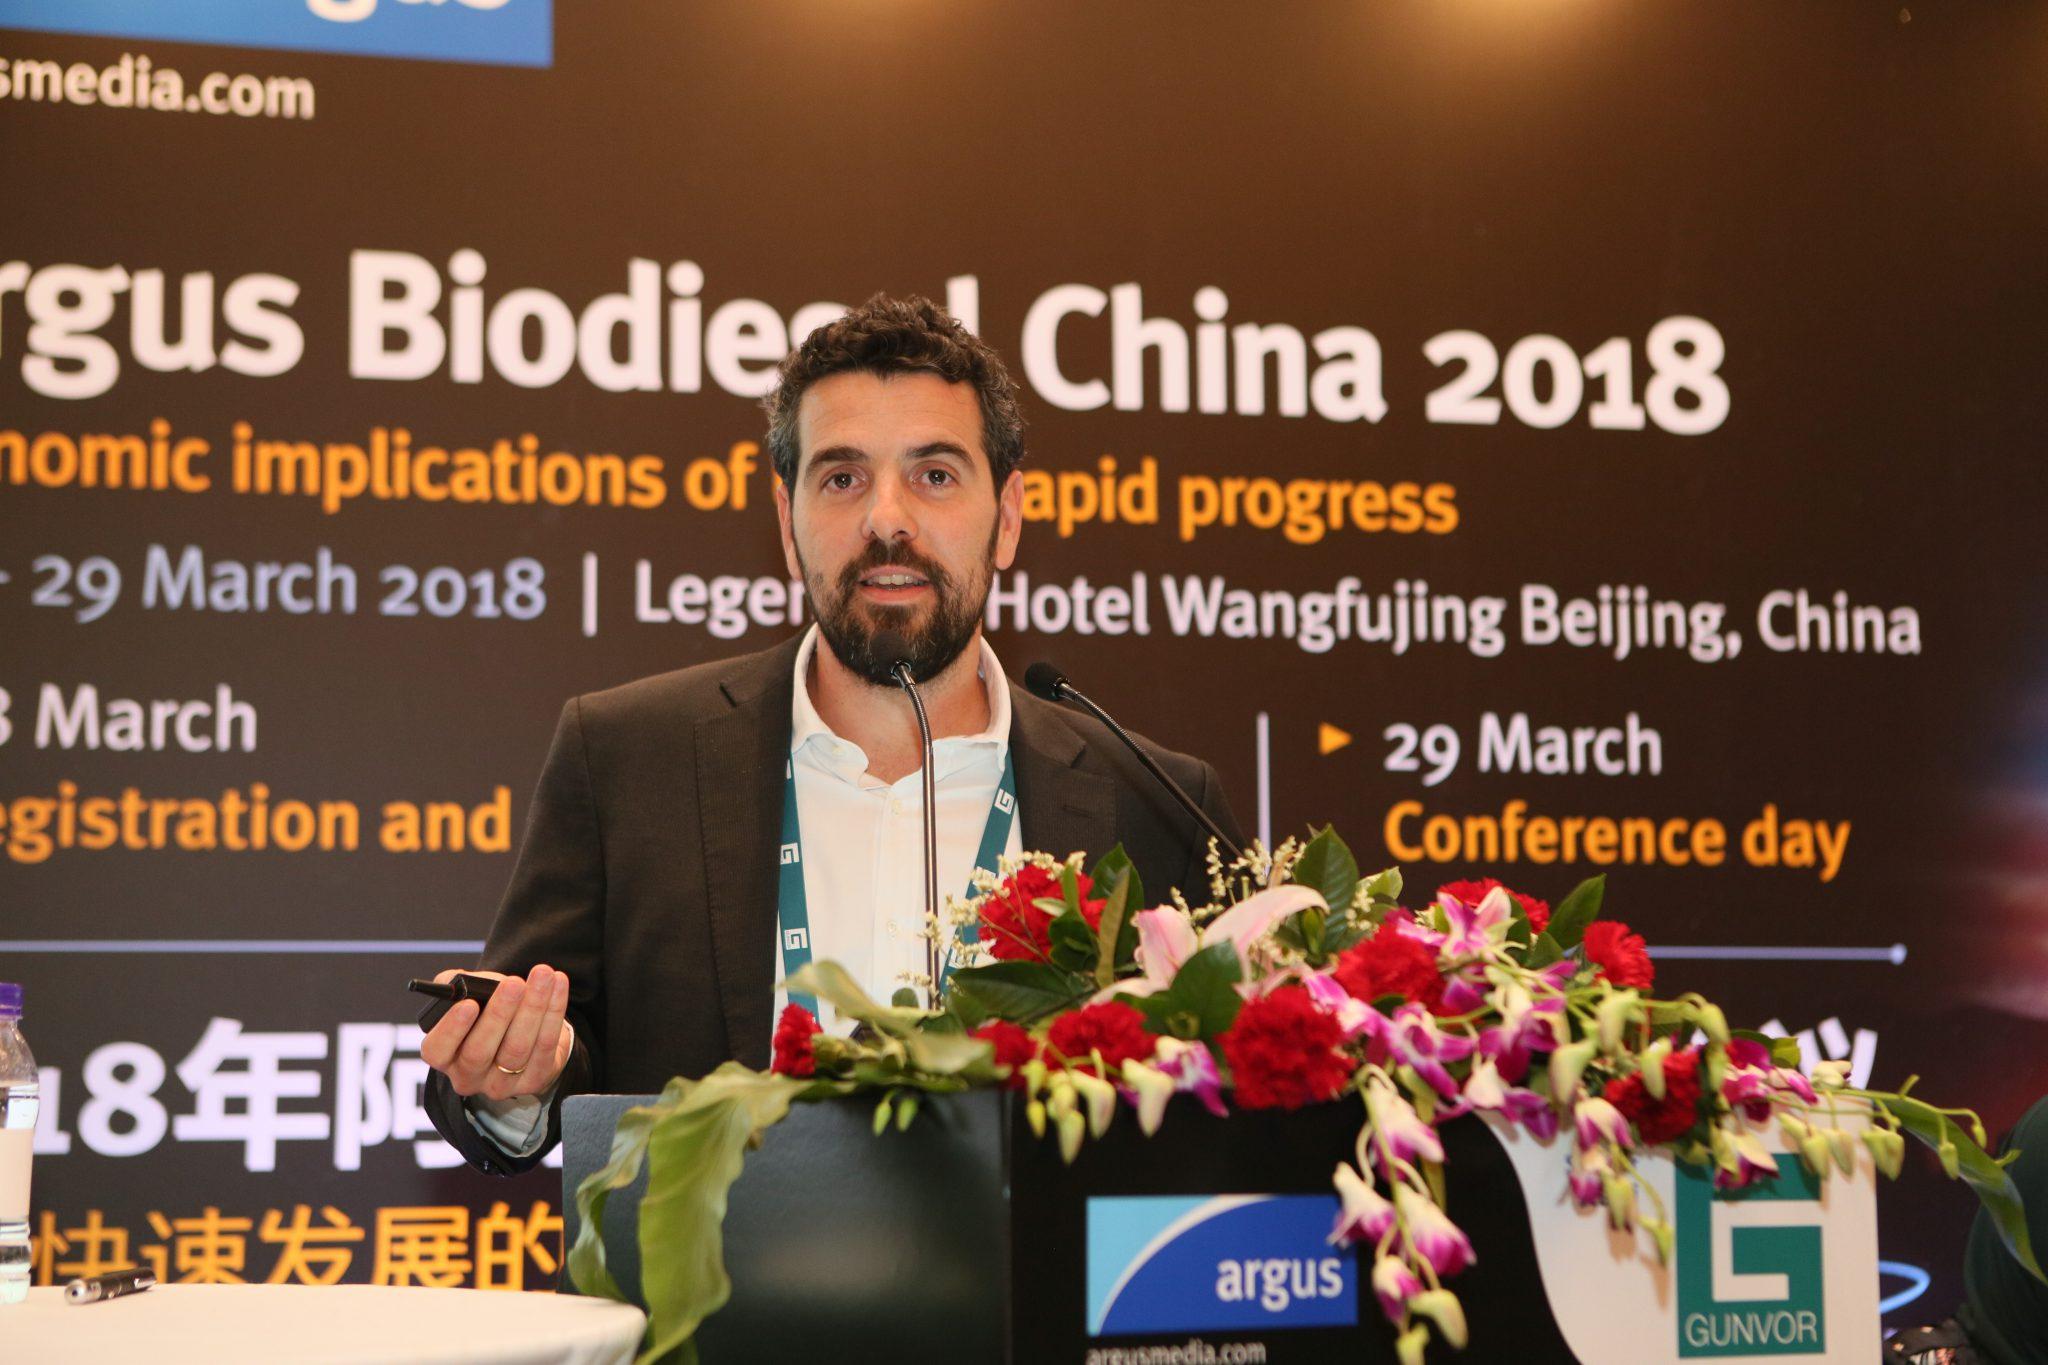 Uco Trading, presente en el Congreso Argus Pekín 2018